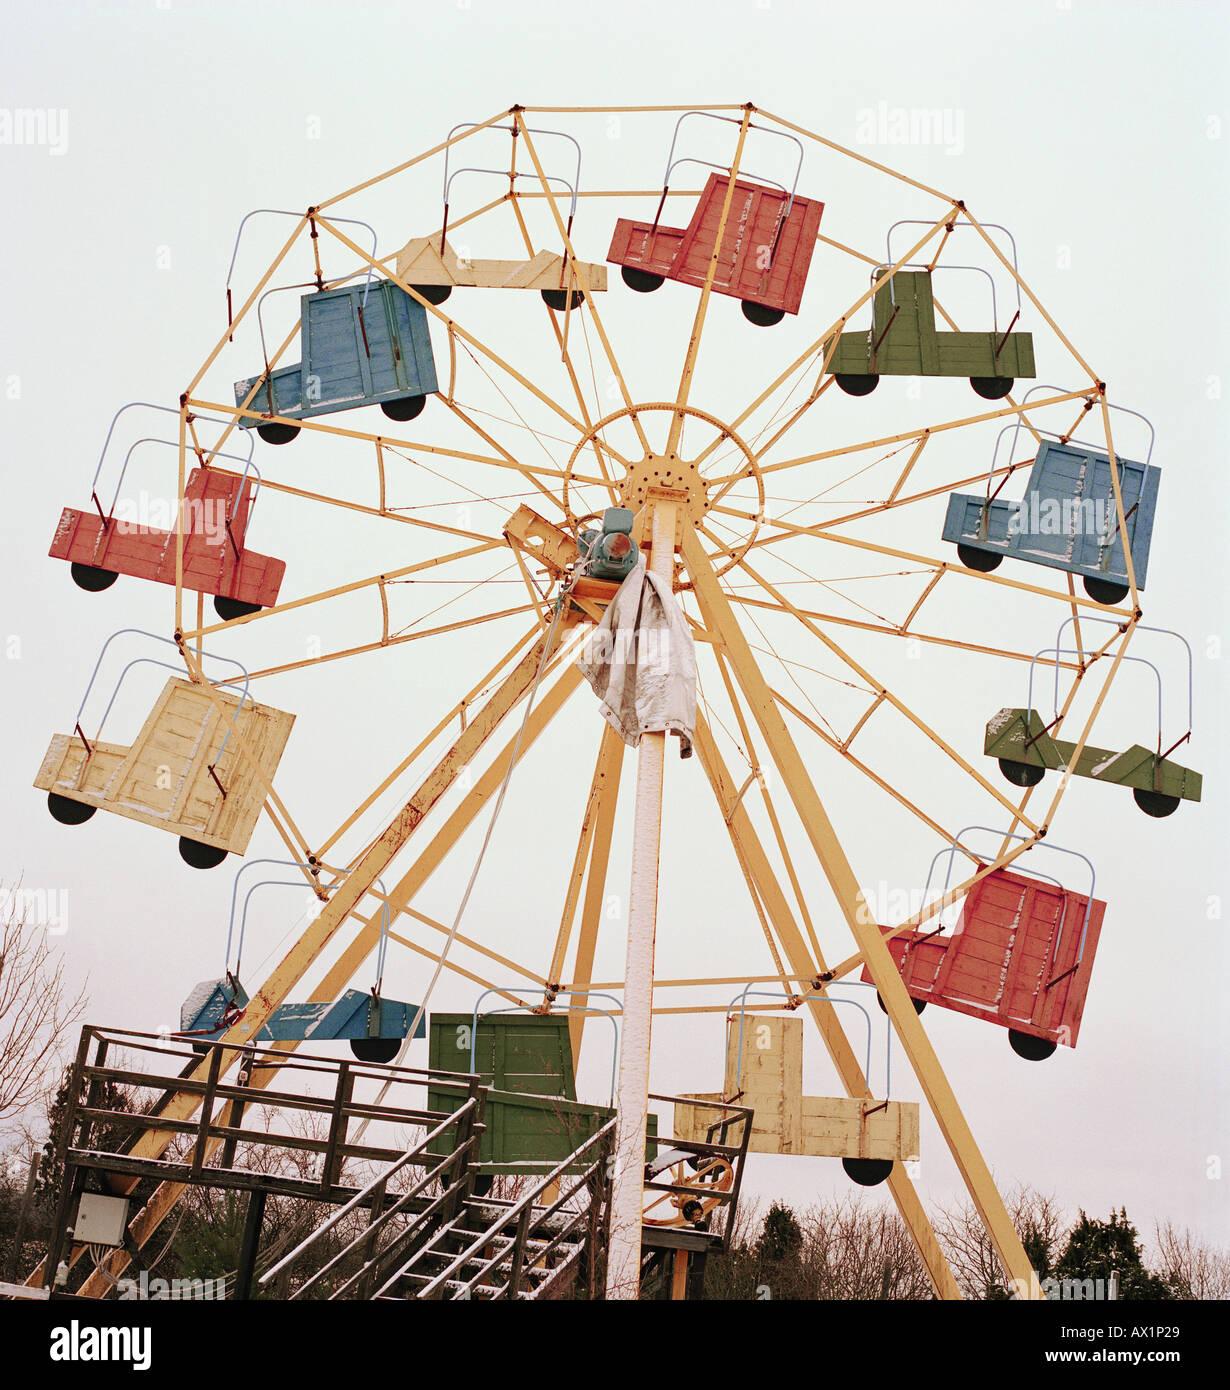 A retro ferris wheel - Stock Image